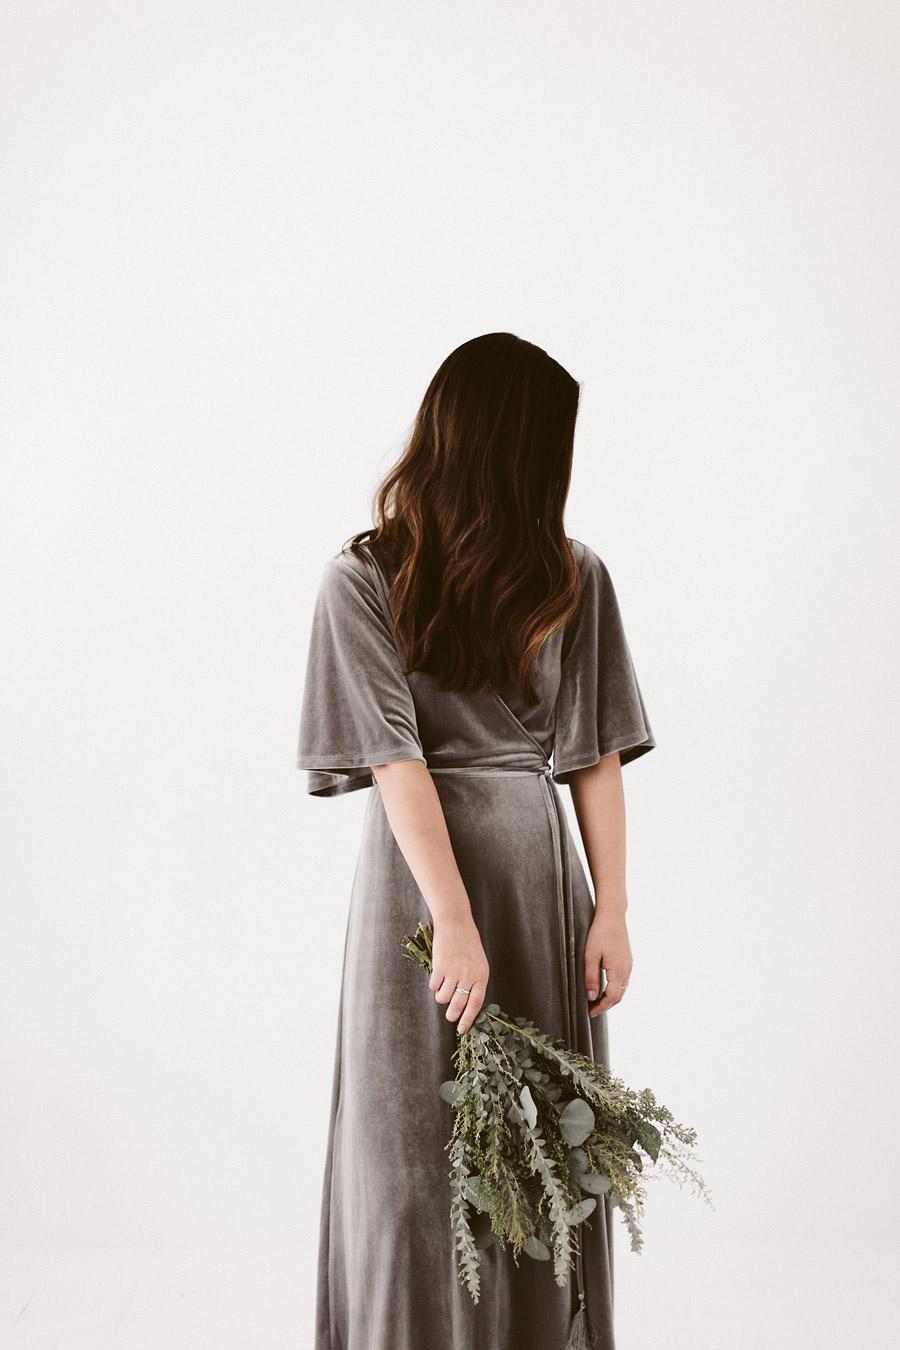 """Beauty in simplicity"", © Tiarra Sorte, Seattle, Wa, United States, Professional : Fashion Narratives, Rangefinder Lifestyle 2017 Winner"